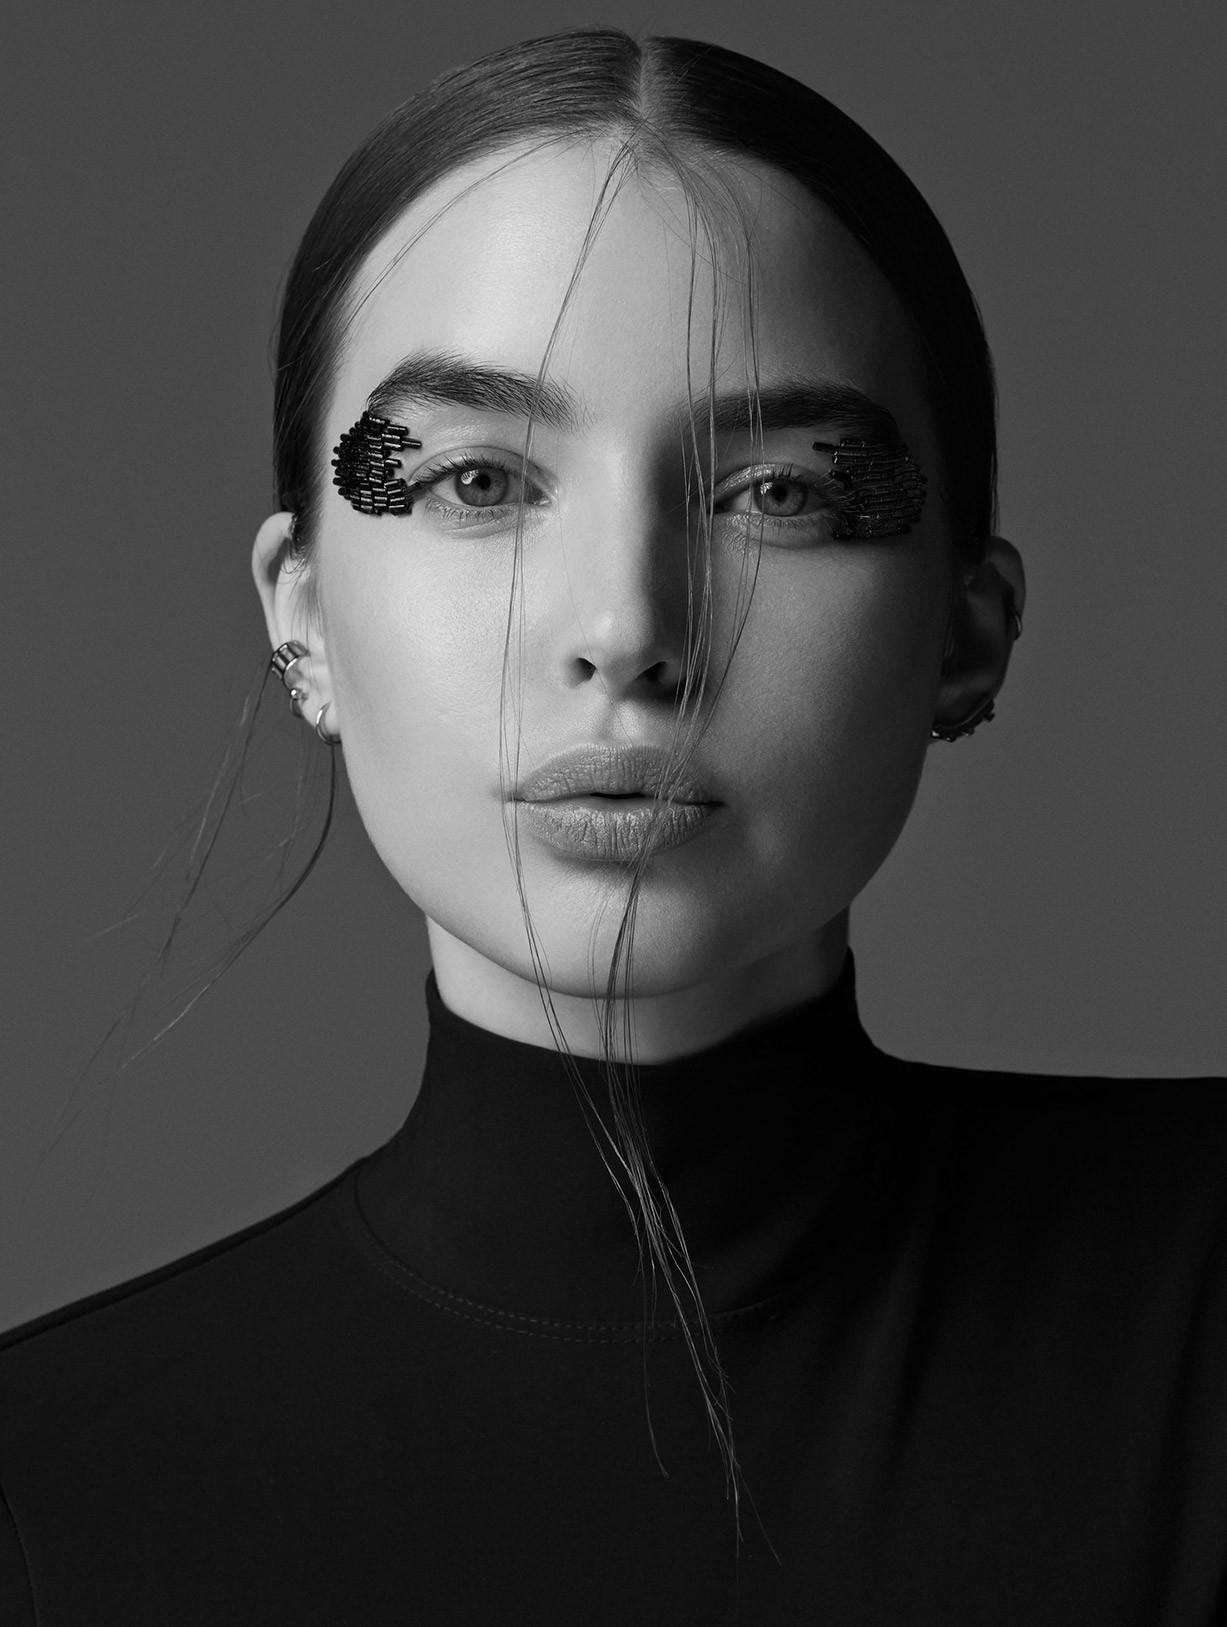 Эли Майкл / Ali Michael by Daniel Clavero - Vogue Ukraine june 2017